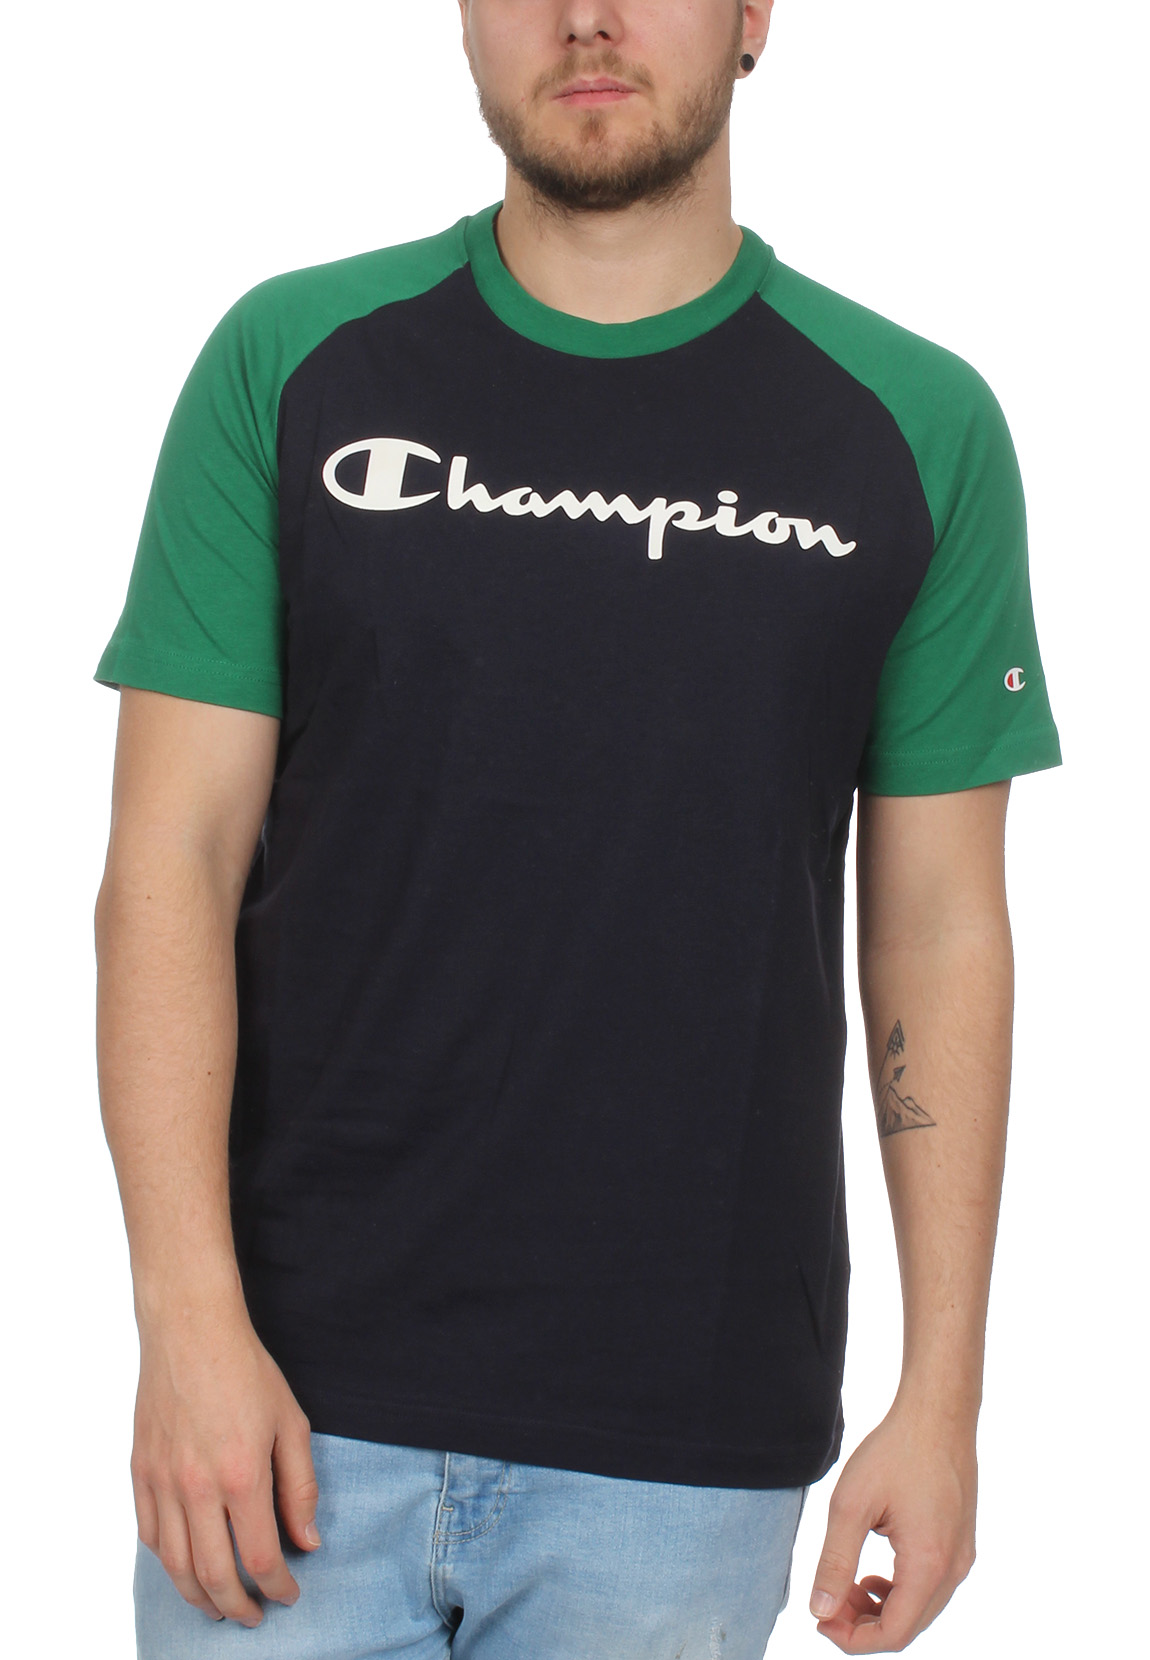 5d4454fc2f35d8 Champion T-Shirt Herren 212688 S19 BS501 NNY VVG Dunkelblau Grün ...